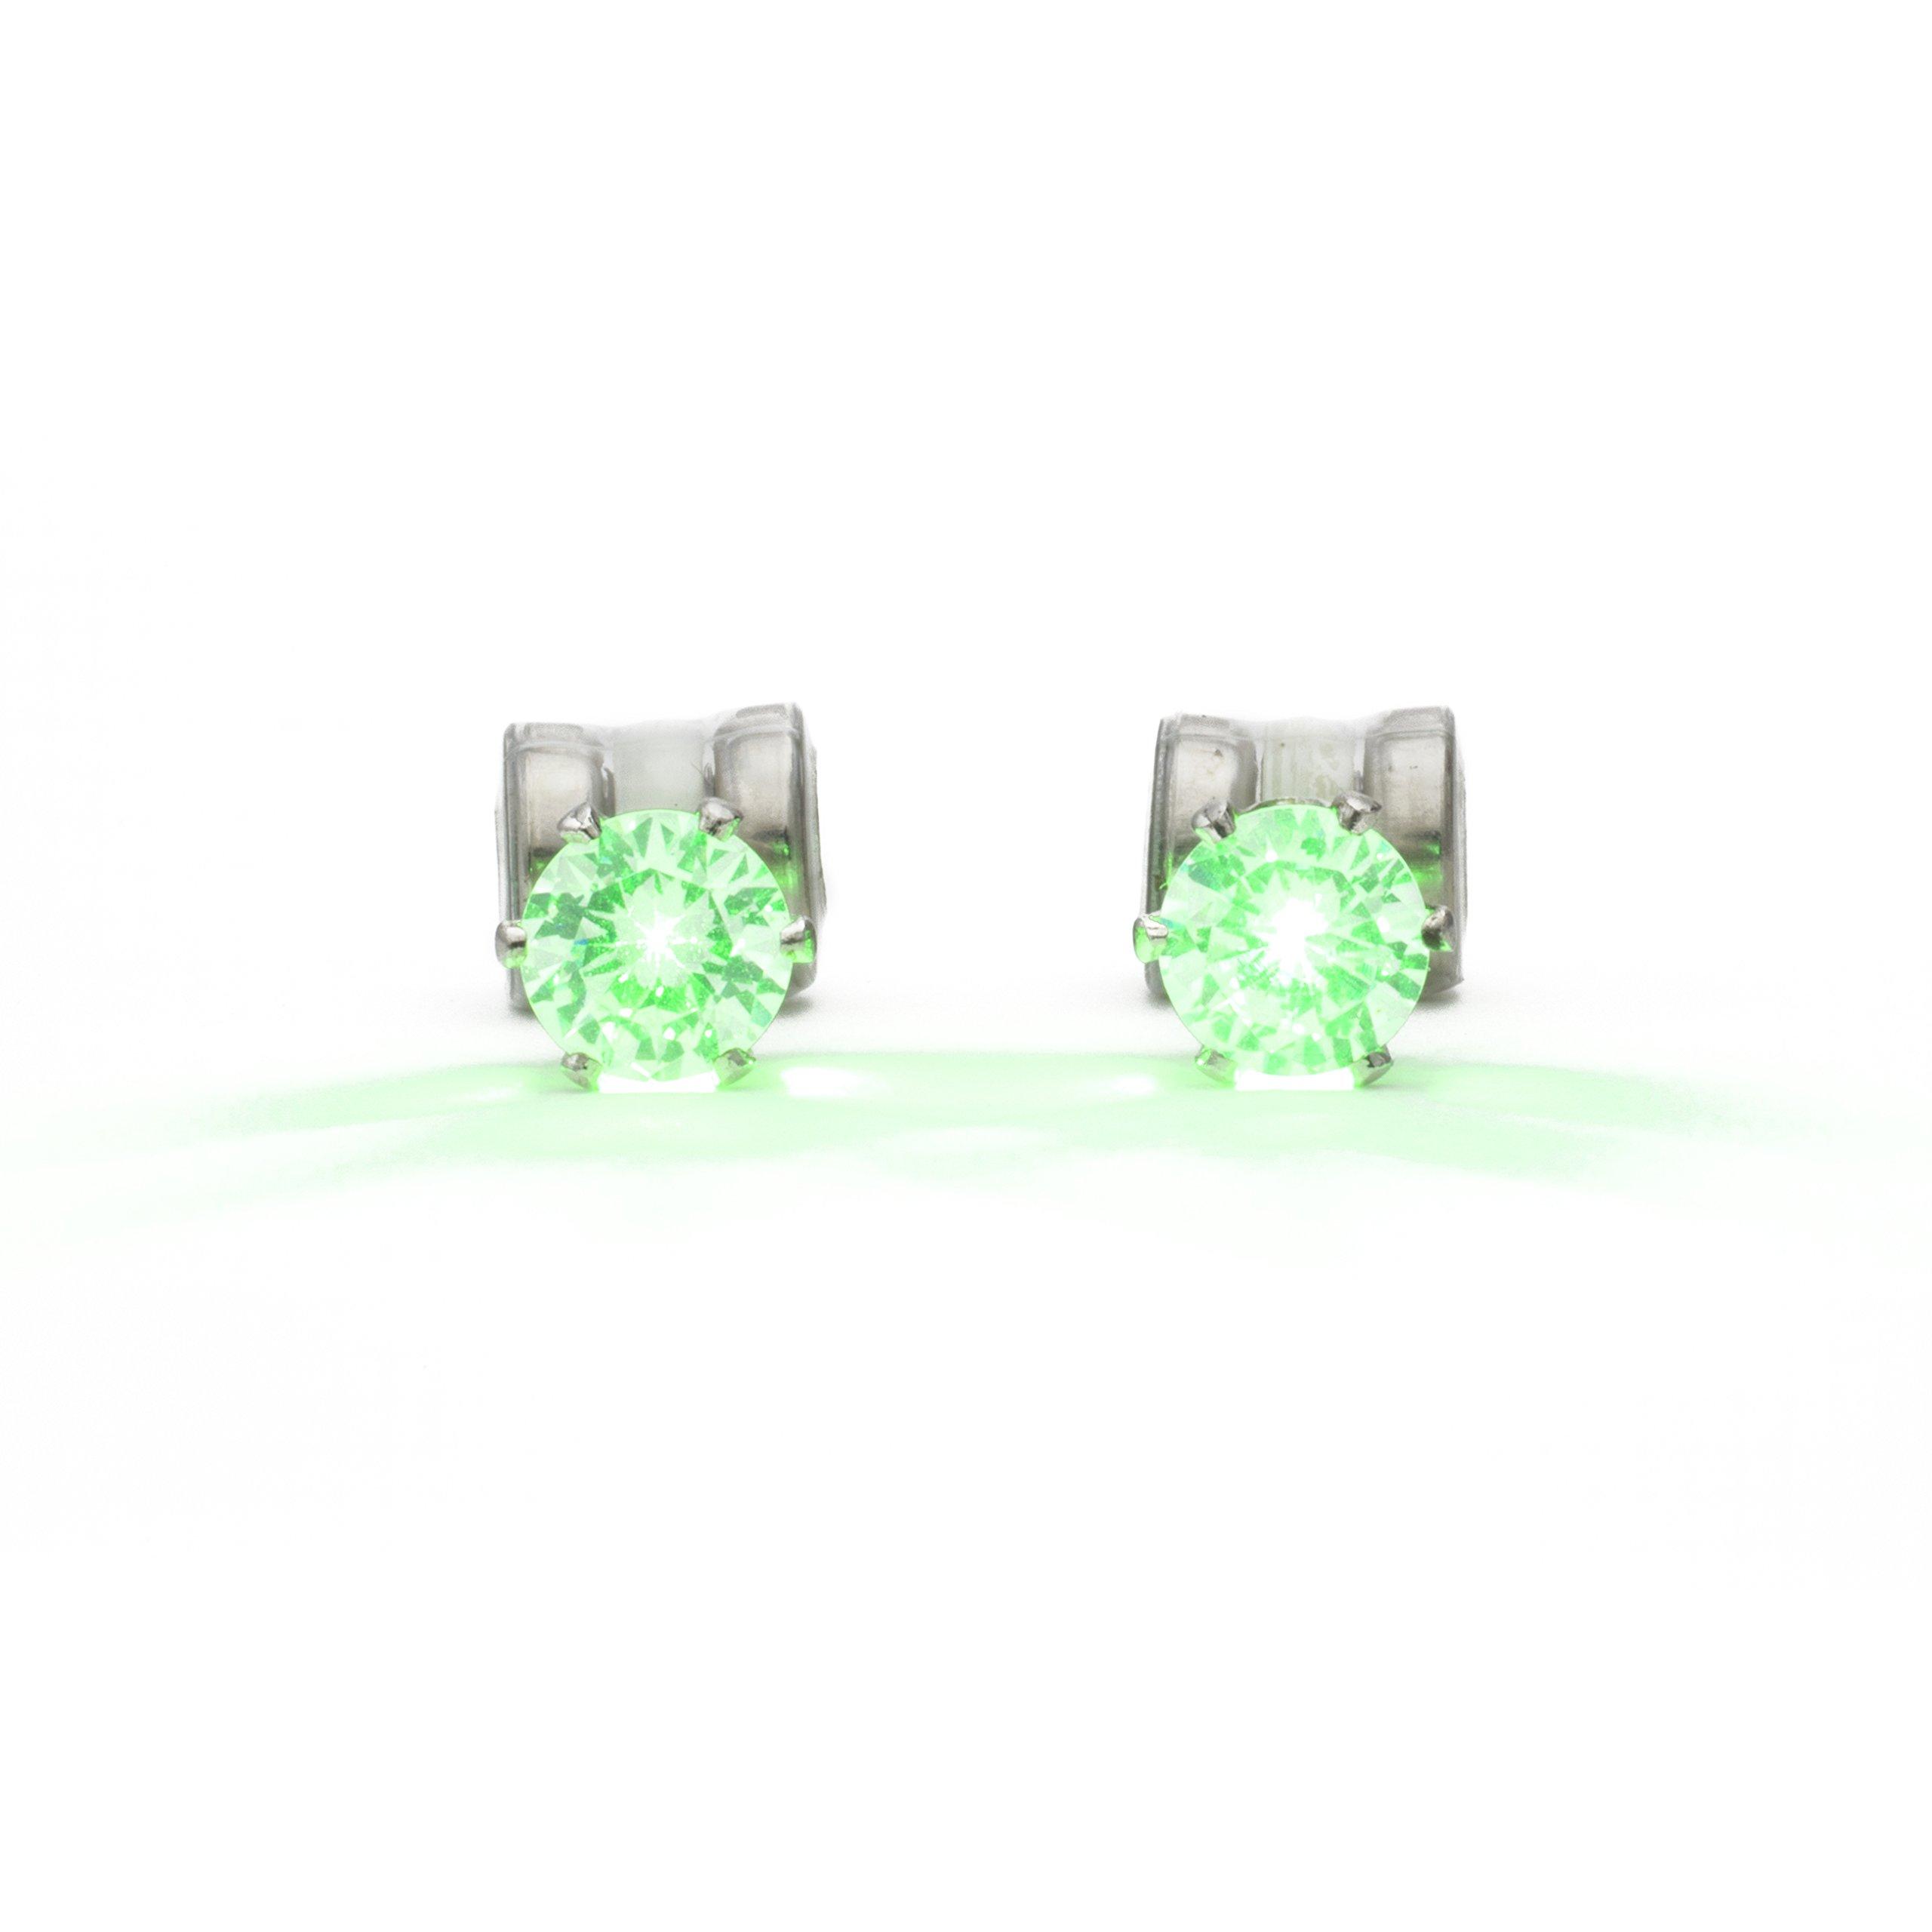 Original Night Ice LED Earrings (Green)